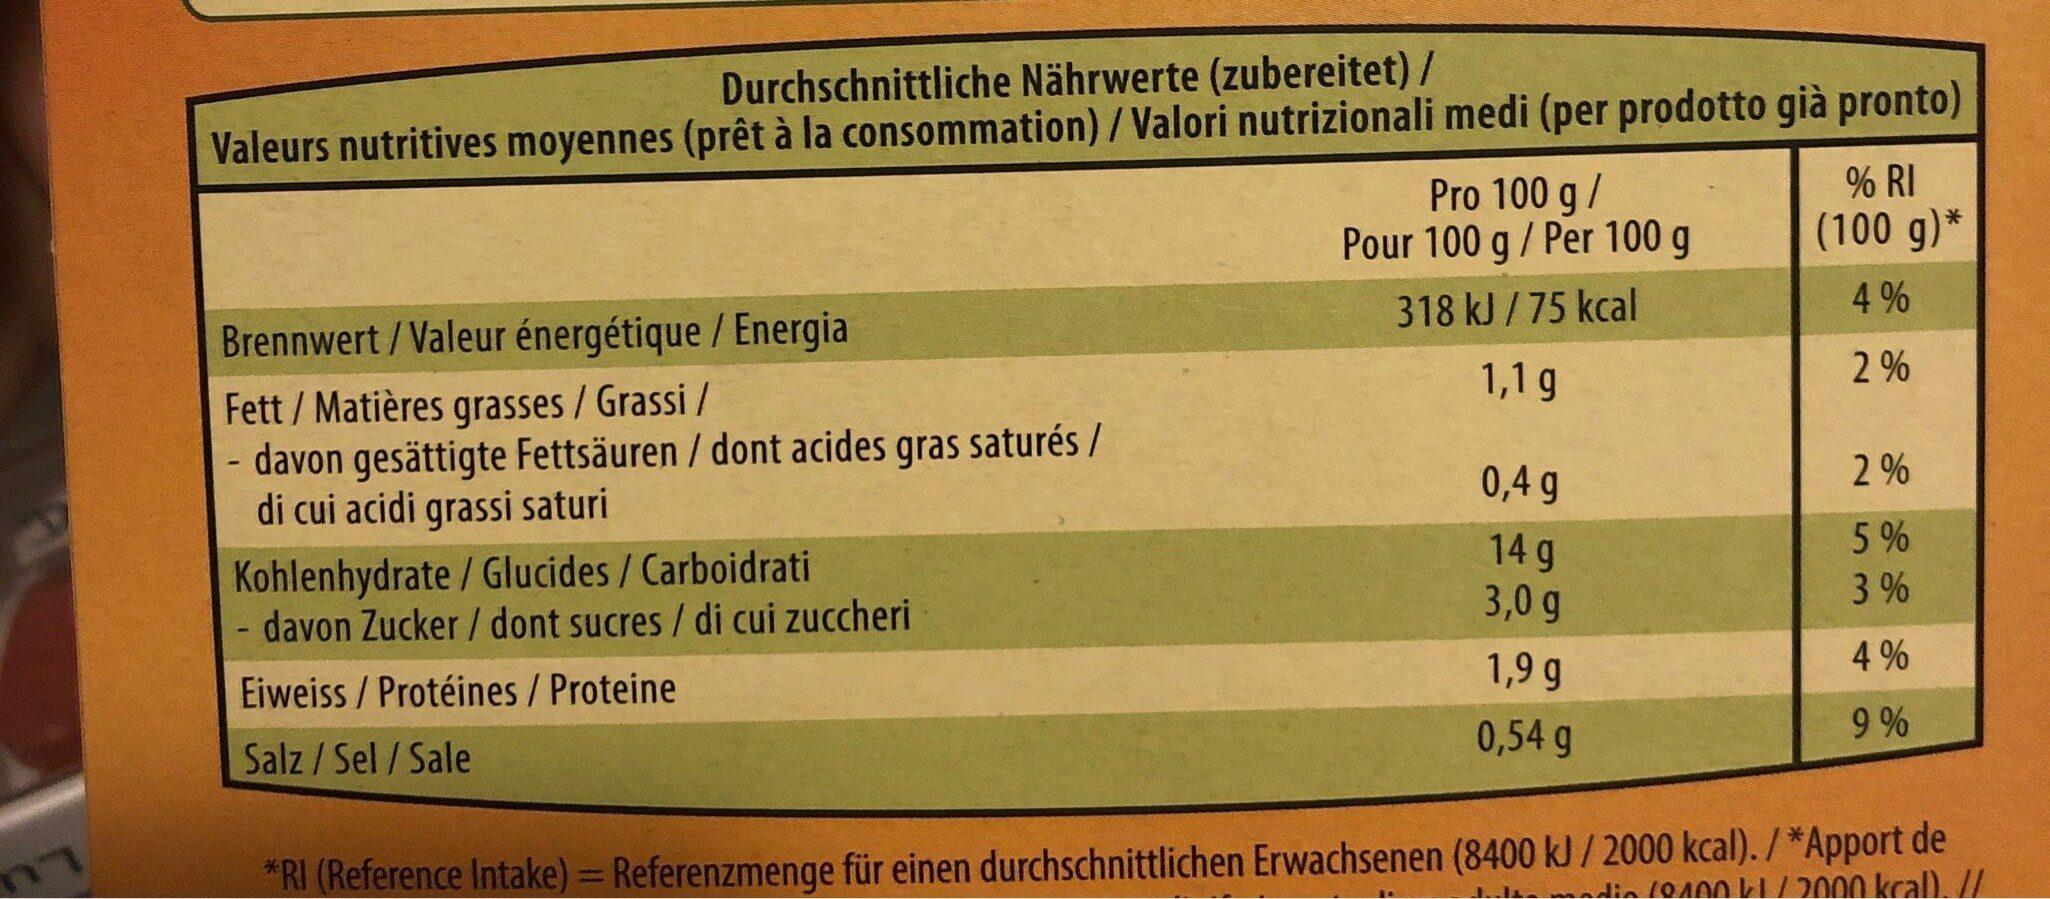 Kartoffel puree - Valori nutrizionali - fr